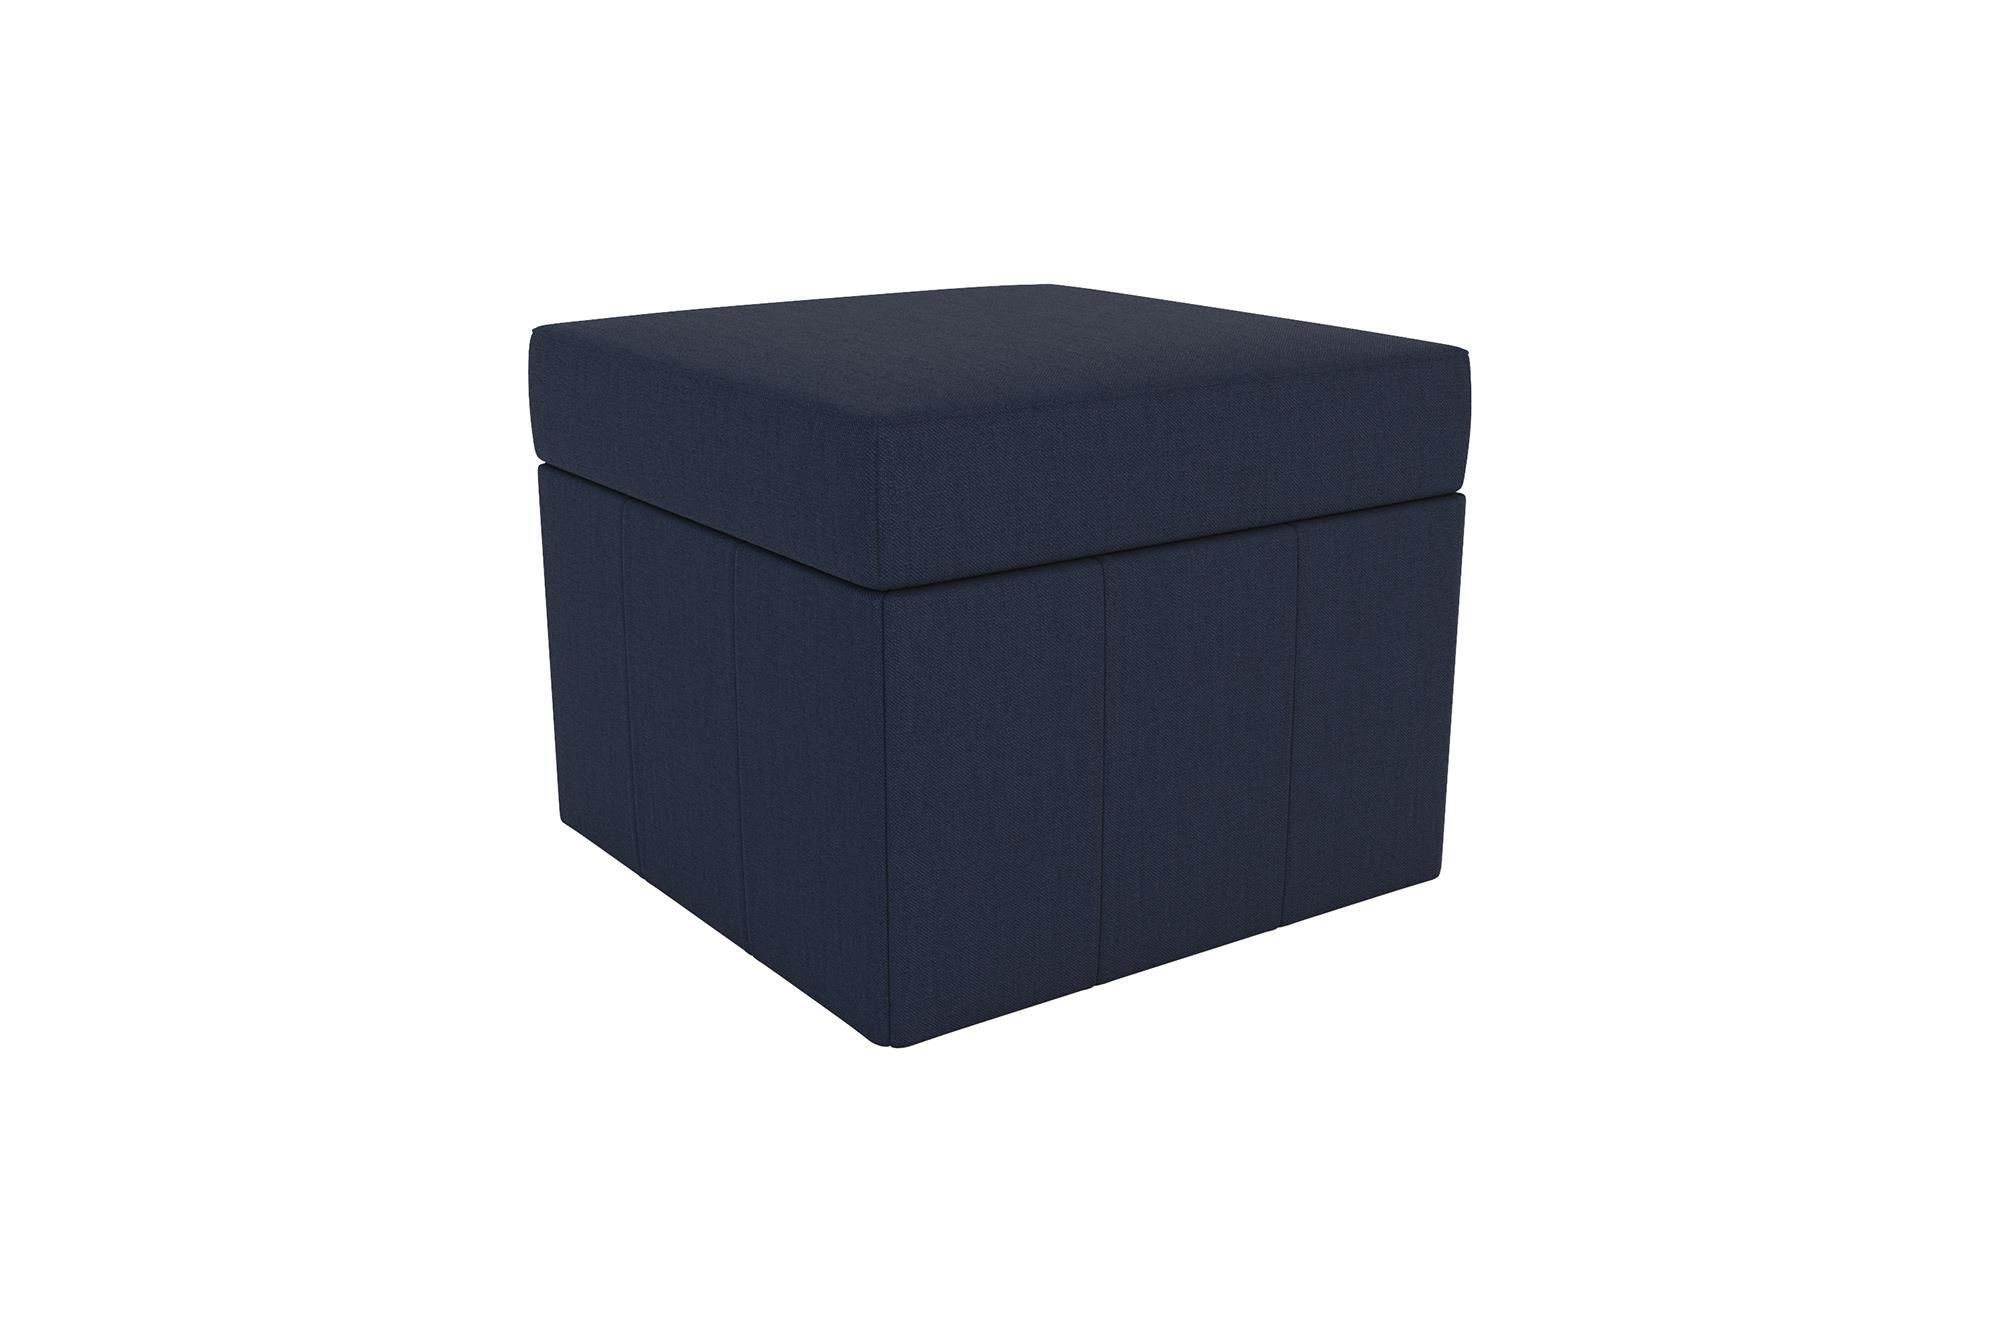 Novogratz Brittany Square Storage Ottoman, Premium Linen Upholstery, Lightweight, Blue Linen